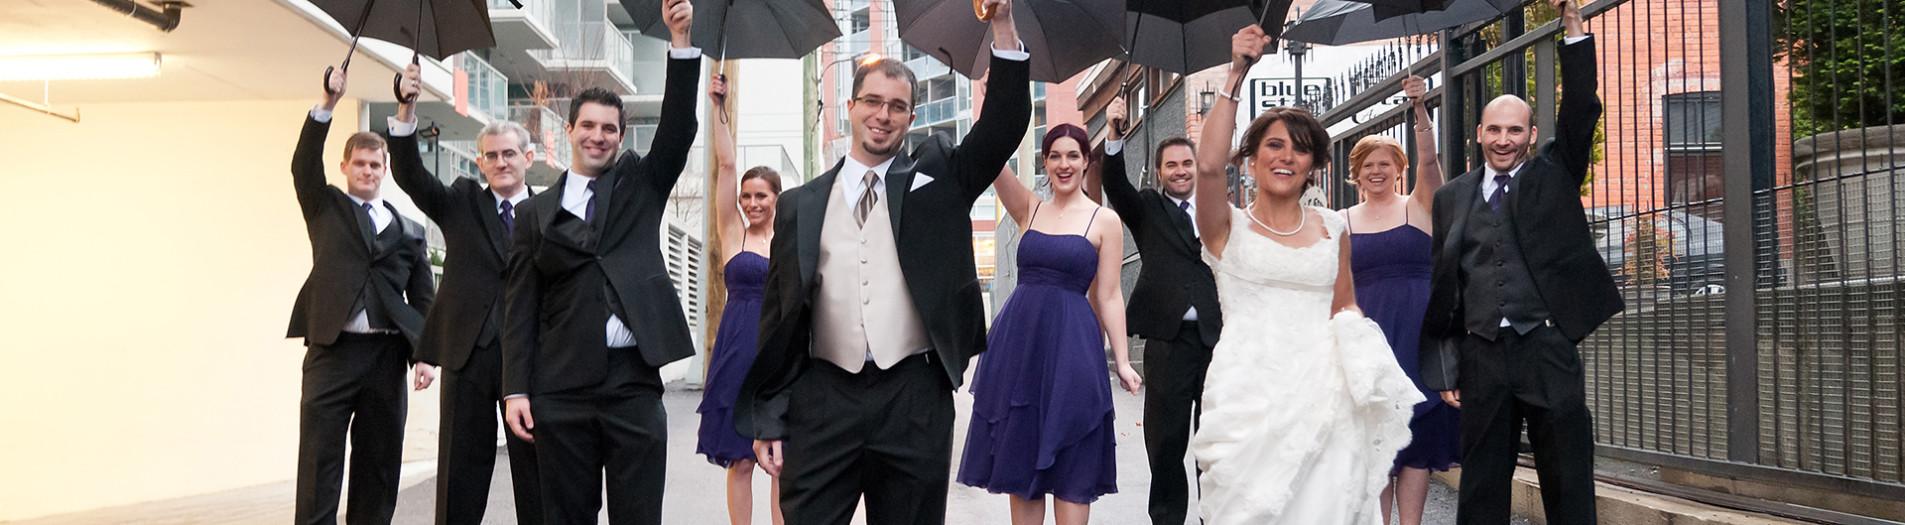 Wedding Portraits - Groups